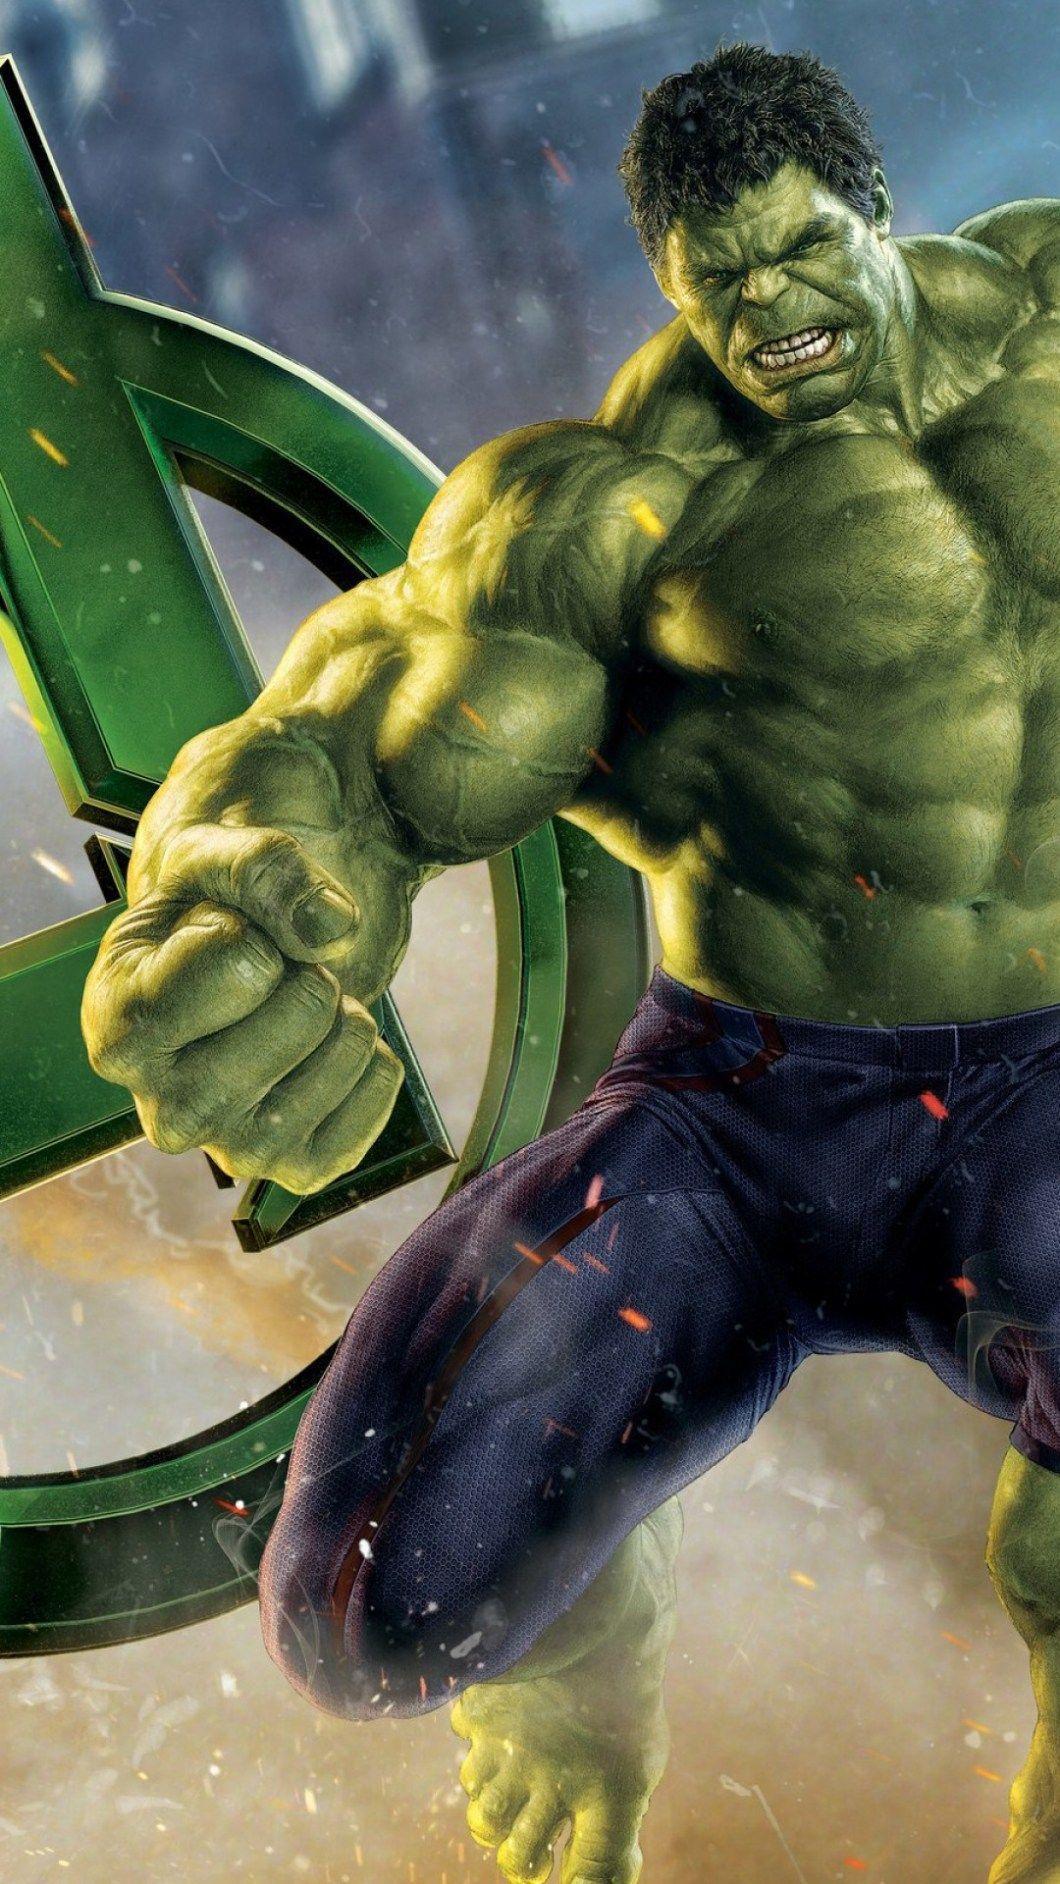 Hulk phone wallpapers top free hulk phone backgrounds - Incredible hulk wallpaper avengers ...